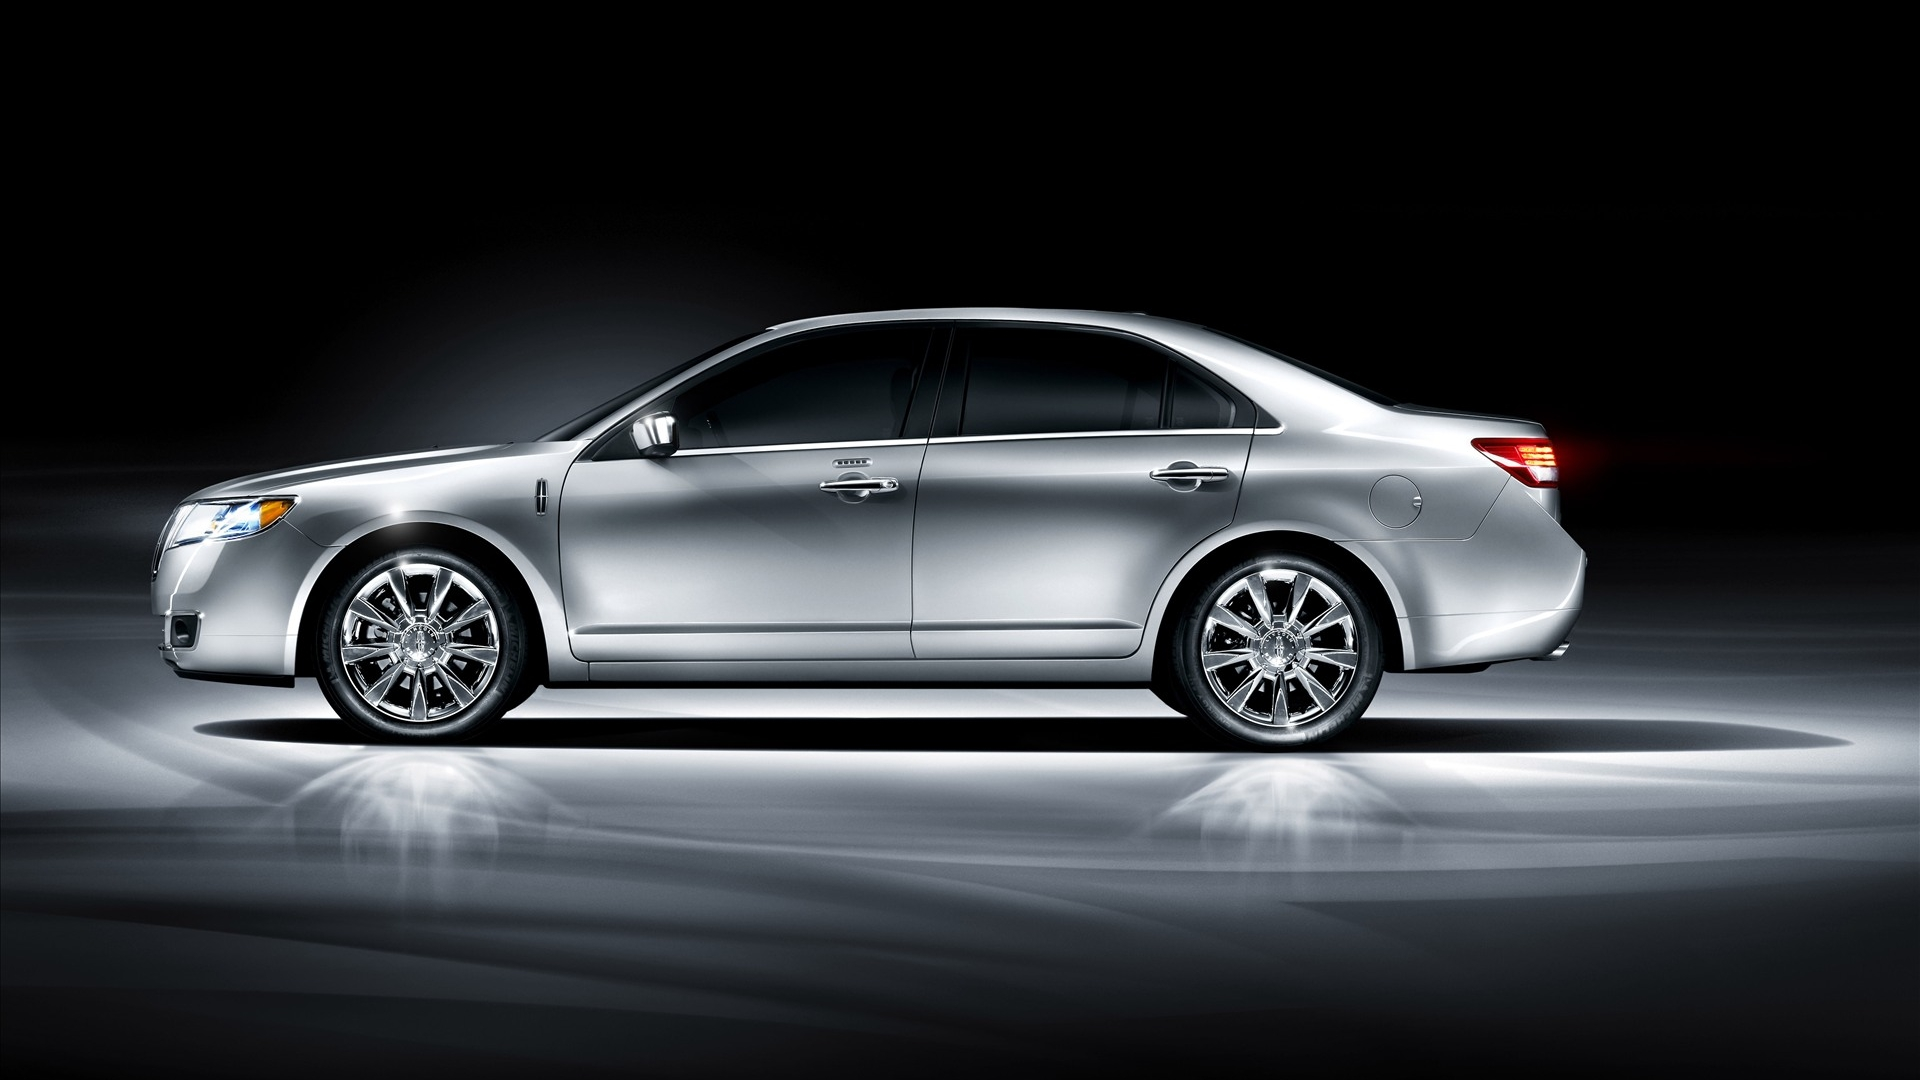 Luxury Vehicle: Luxury Cars Wallpaper